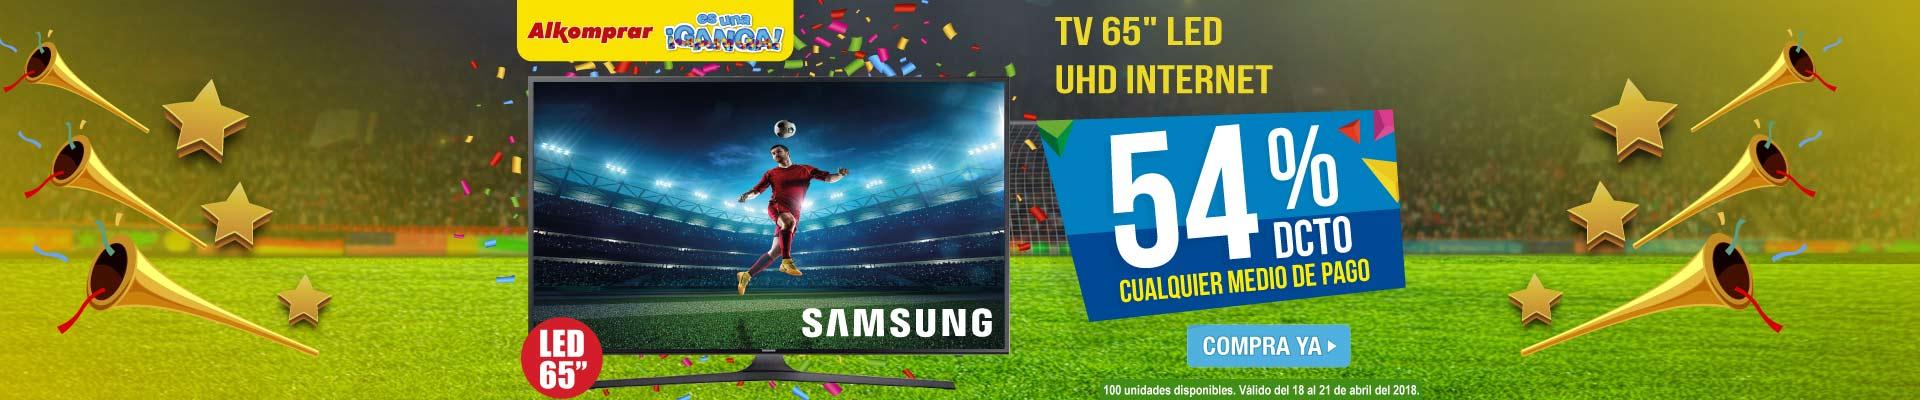 CAT ALKP-1-TV-TV 65 165cm SAMSUNG LED 65MU6100 UHD Internet-prod-Abril18-20